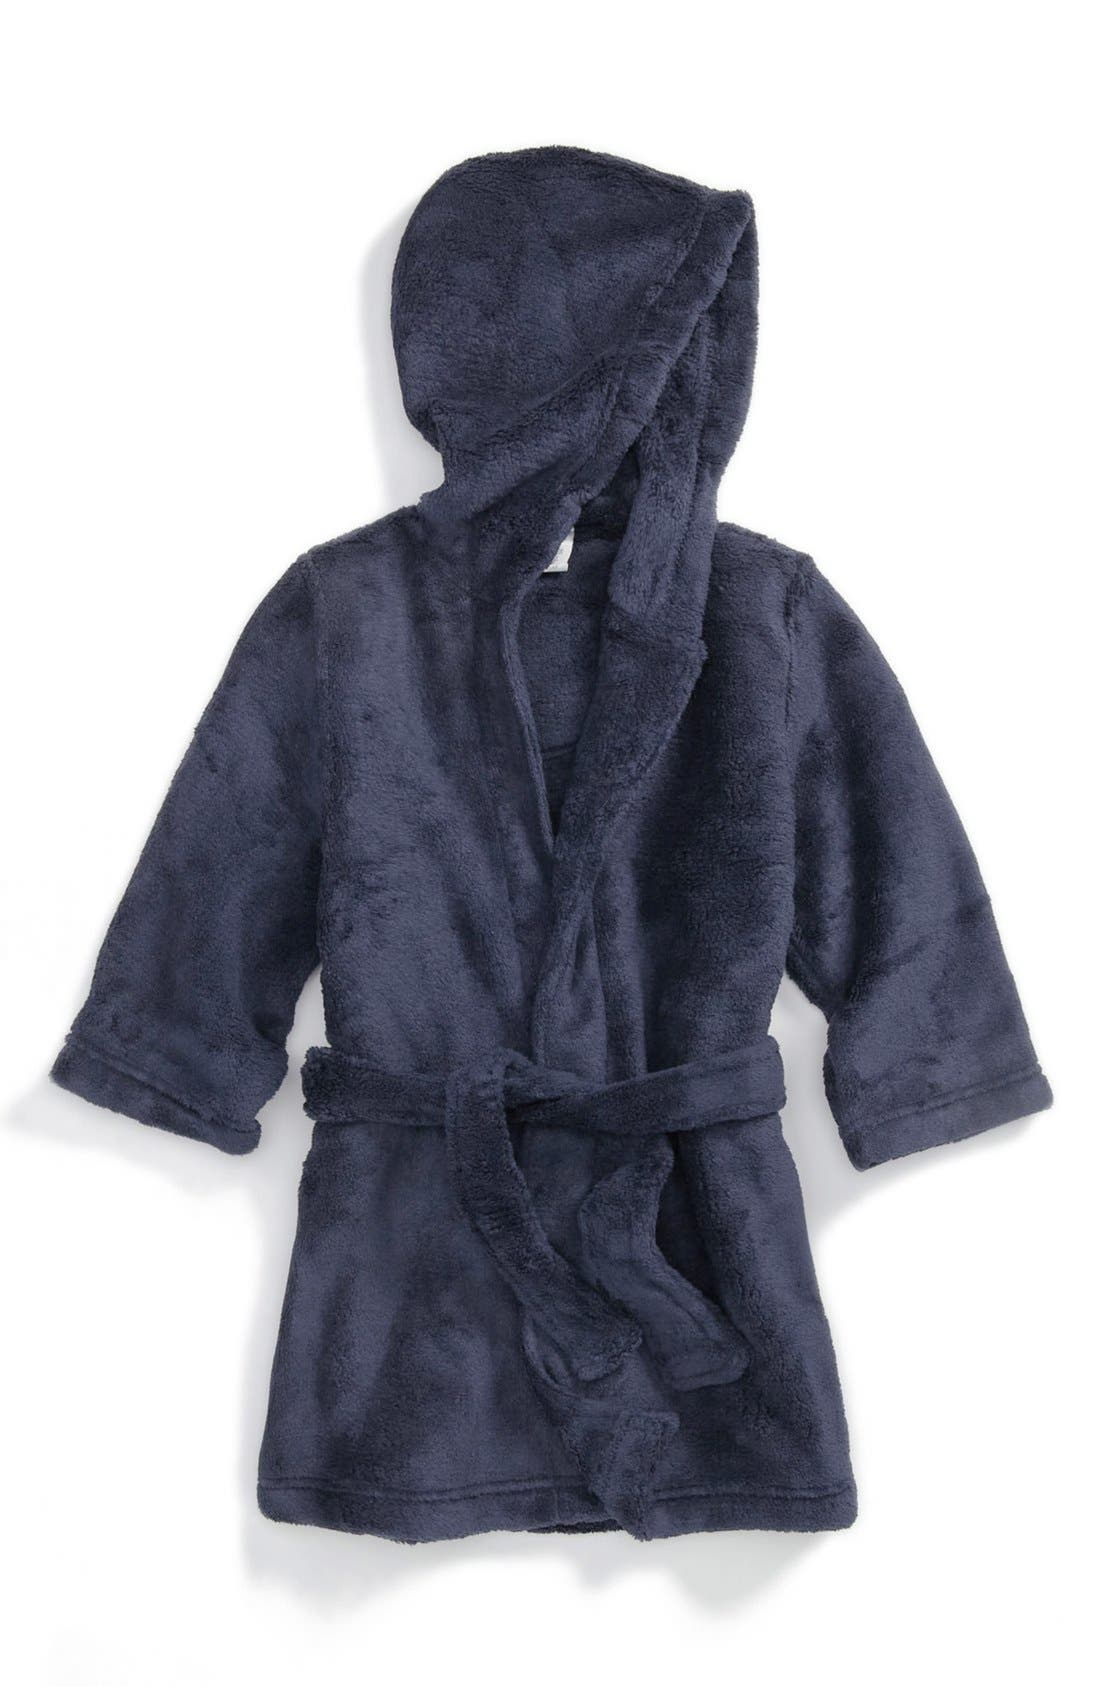 Alternate Image 1 Selected - Tucker + Tate Terry Hooded Robe (Toddler)